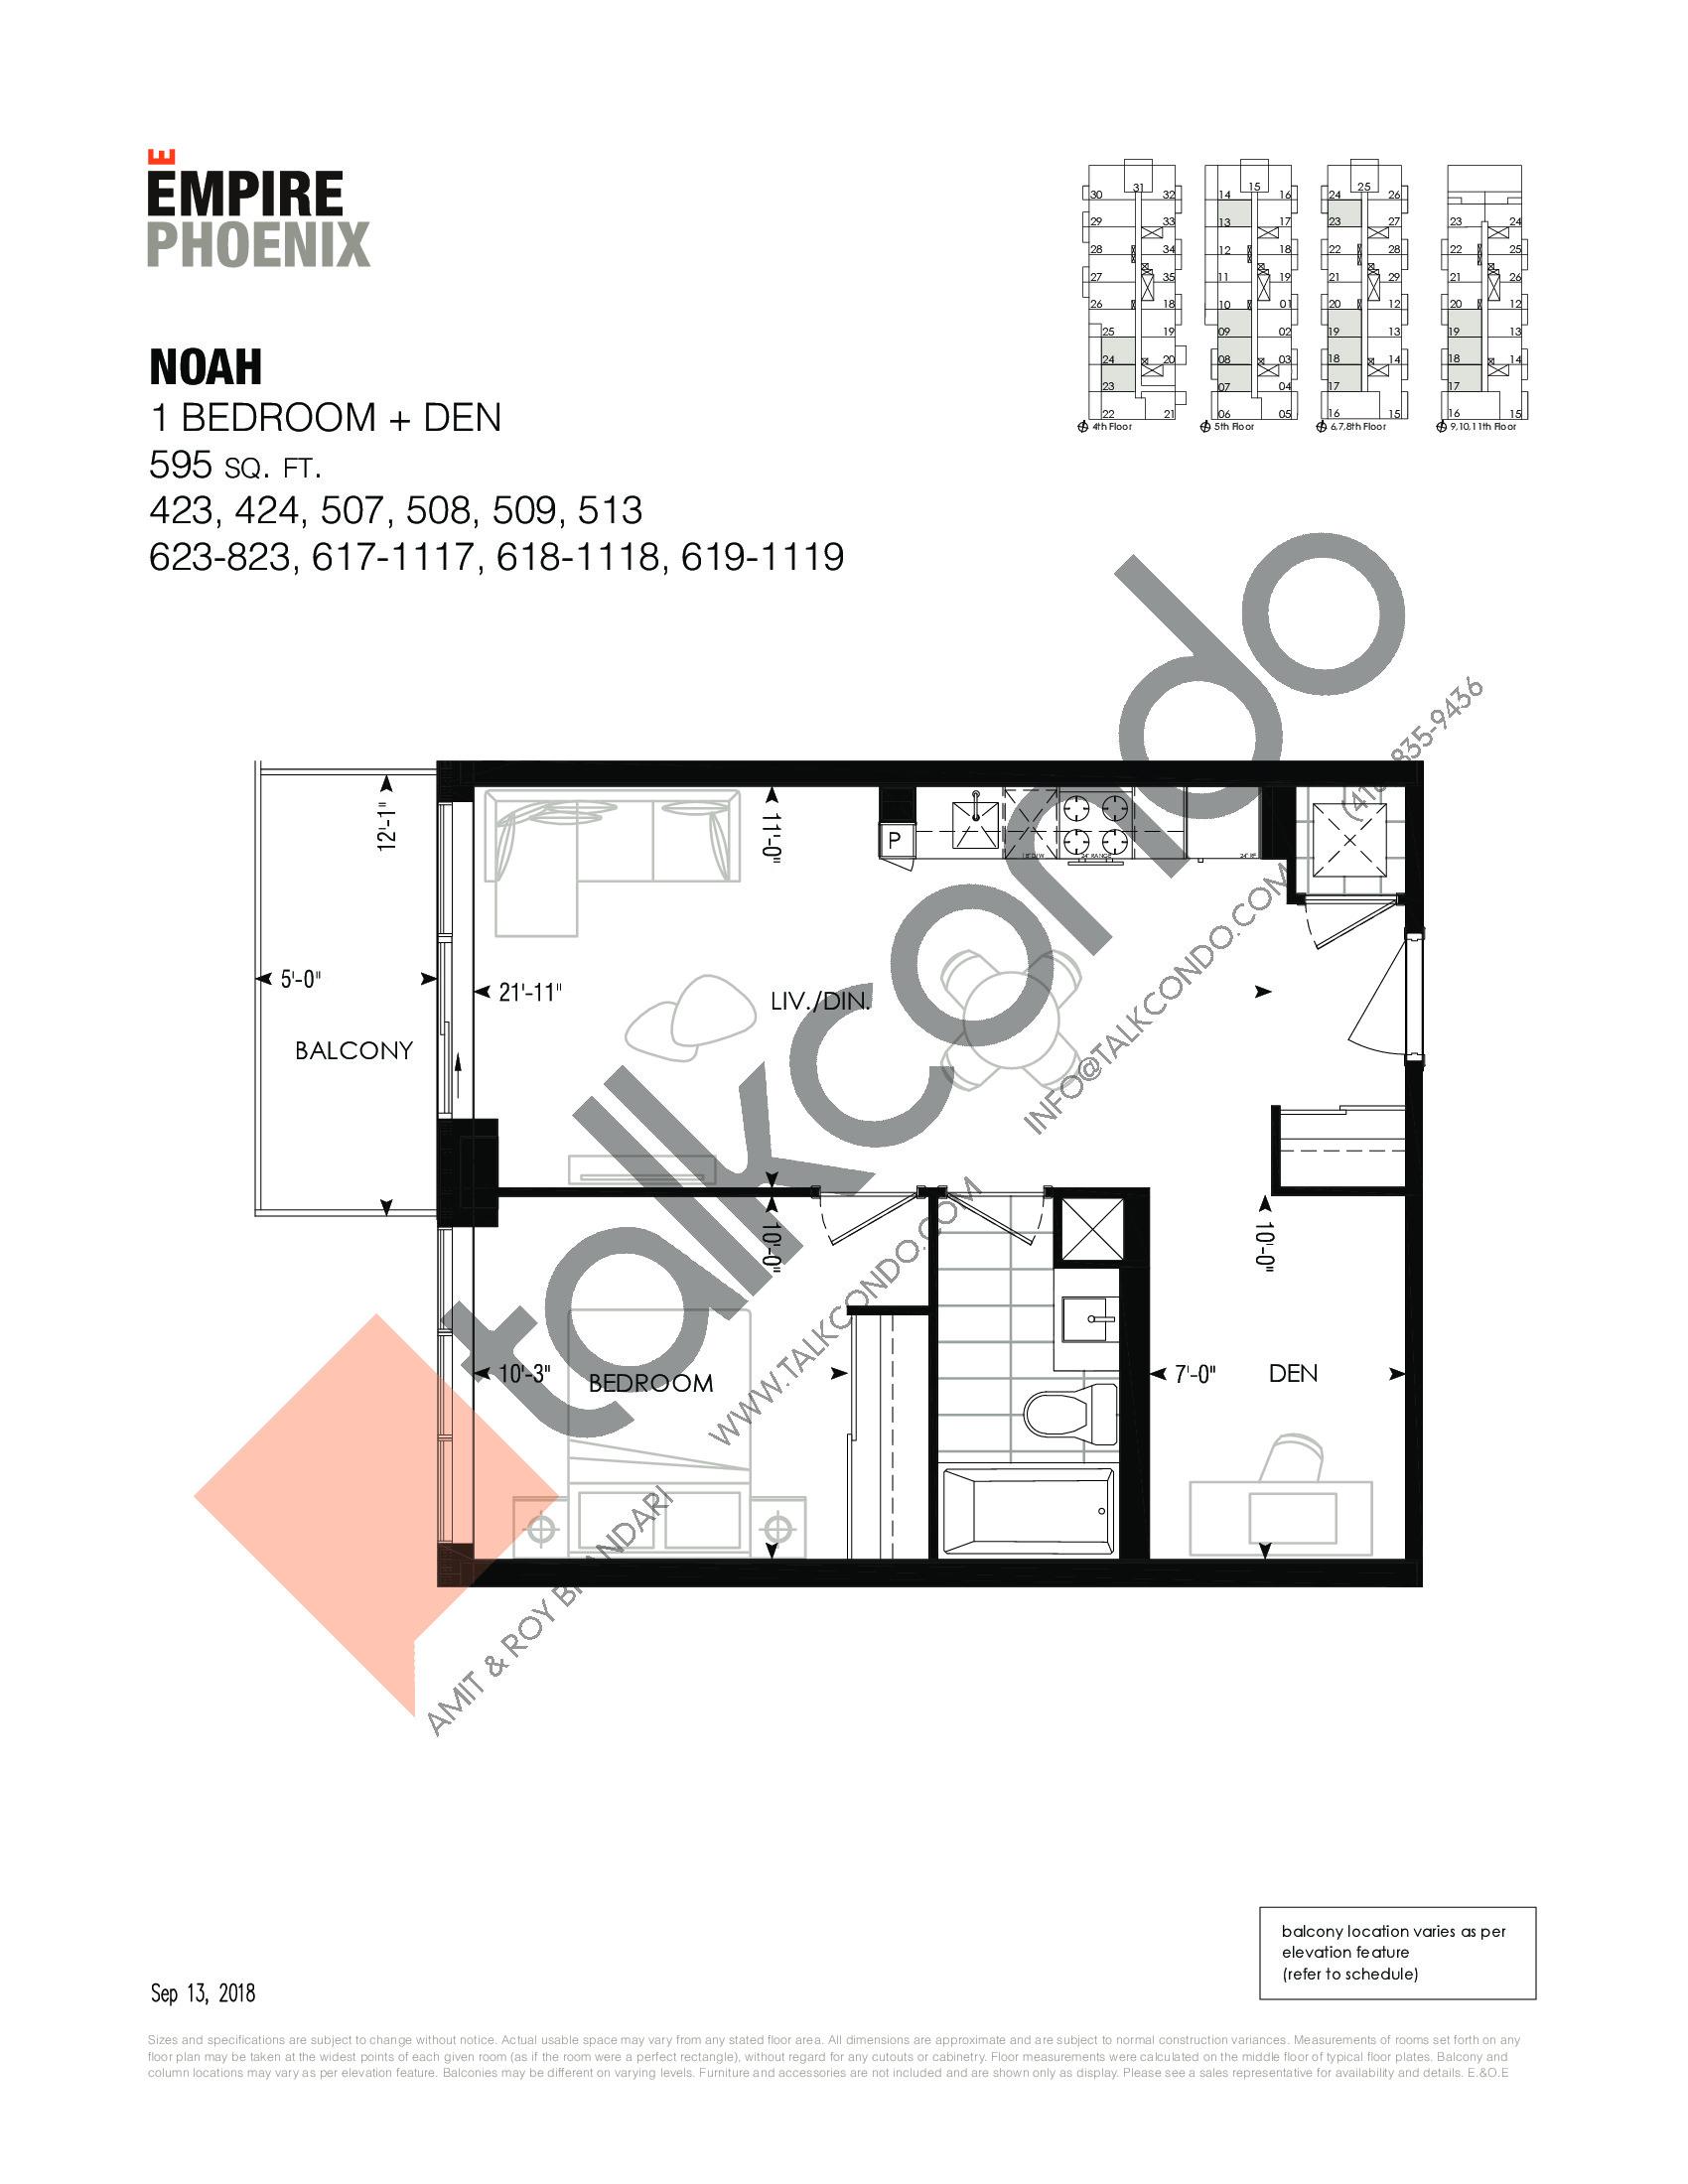 Noah Floor Plan at Empire Phoenix Phase 2 Condos - 595 sq.ft